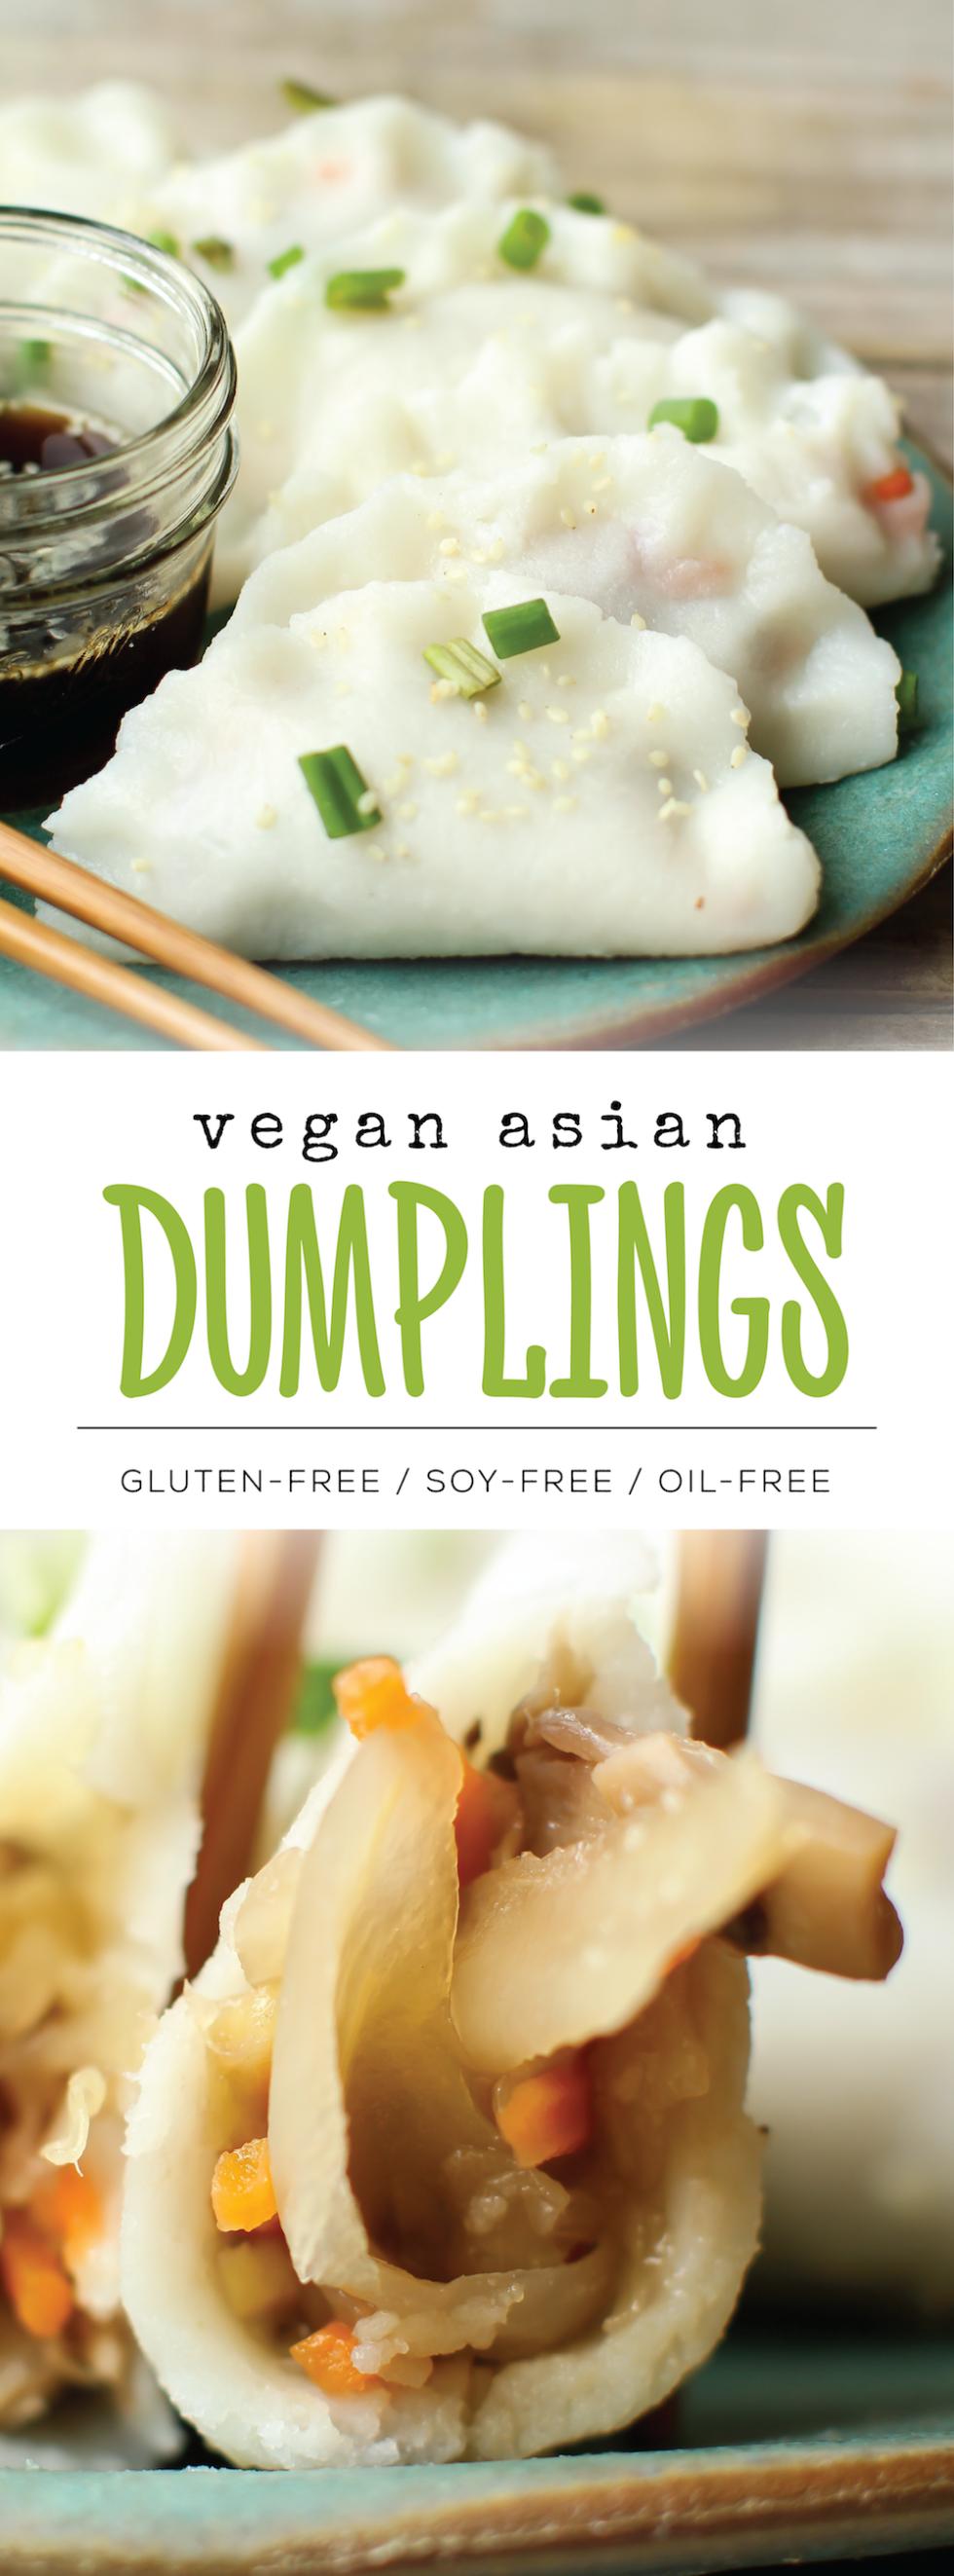 Vegan Dumplings with Easy GlutenFree Wonton Wrappers